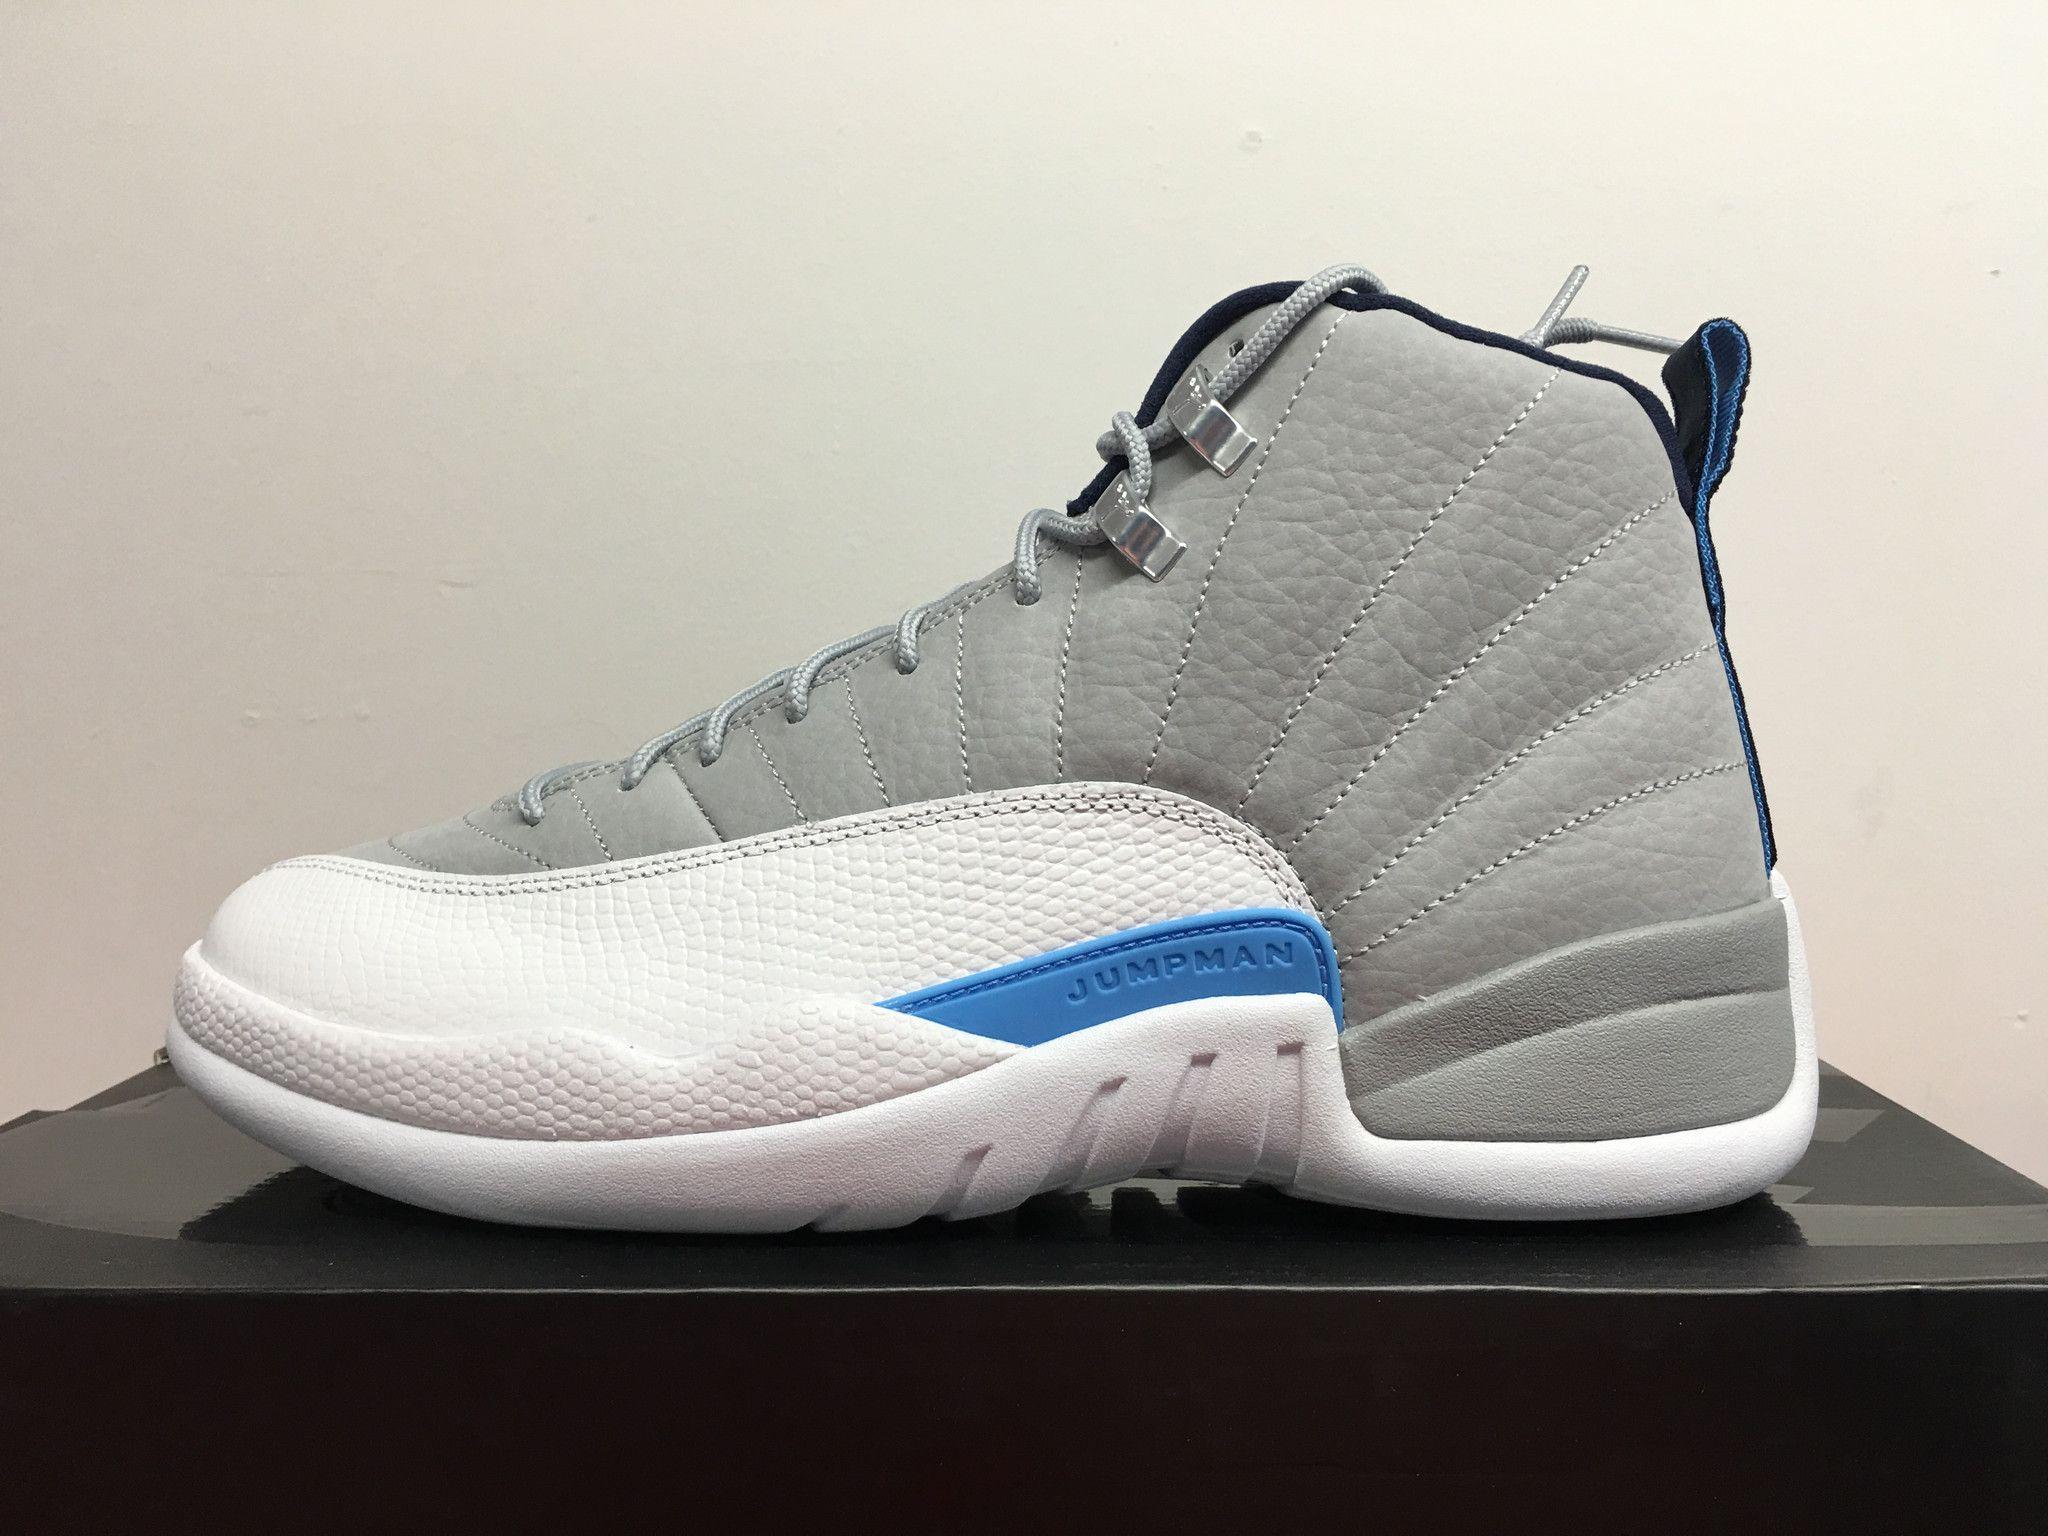 822ebff9920 Look Out For The Air Jordan 12 Grey University Blue Next Week